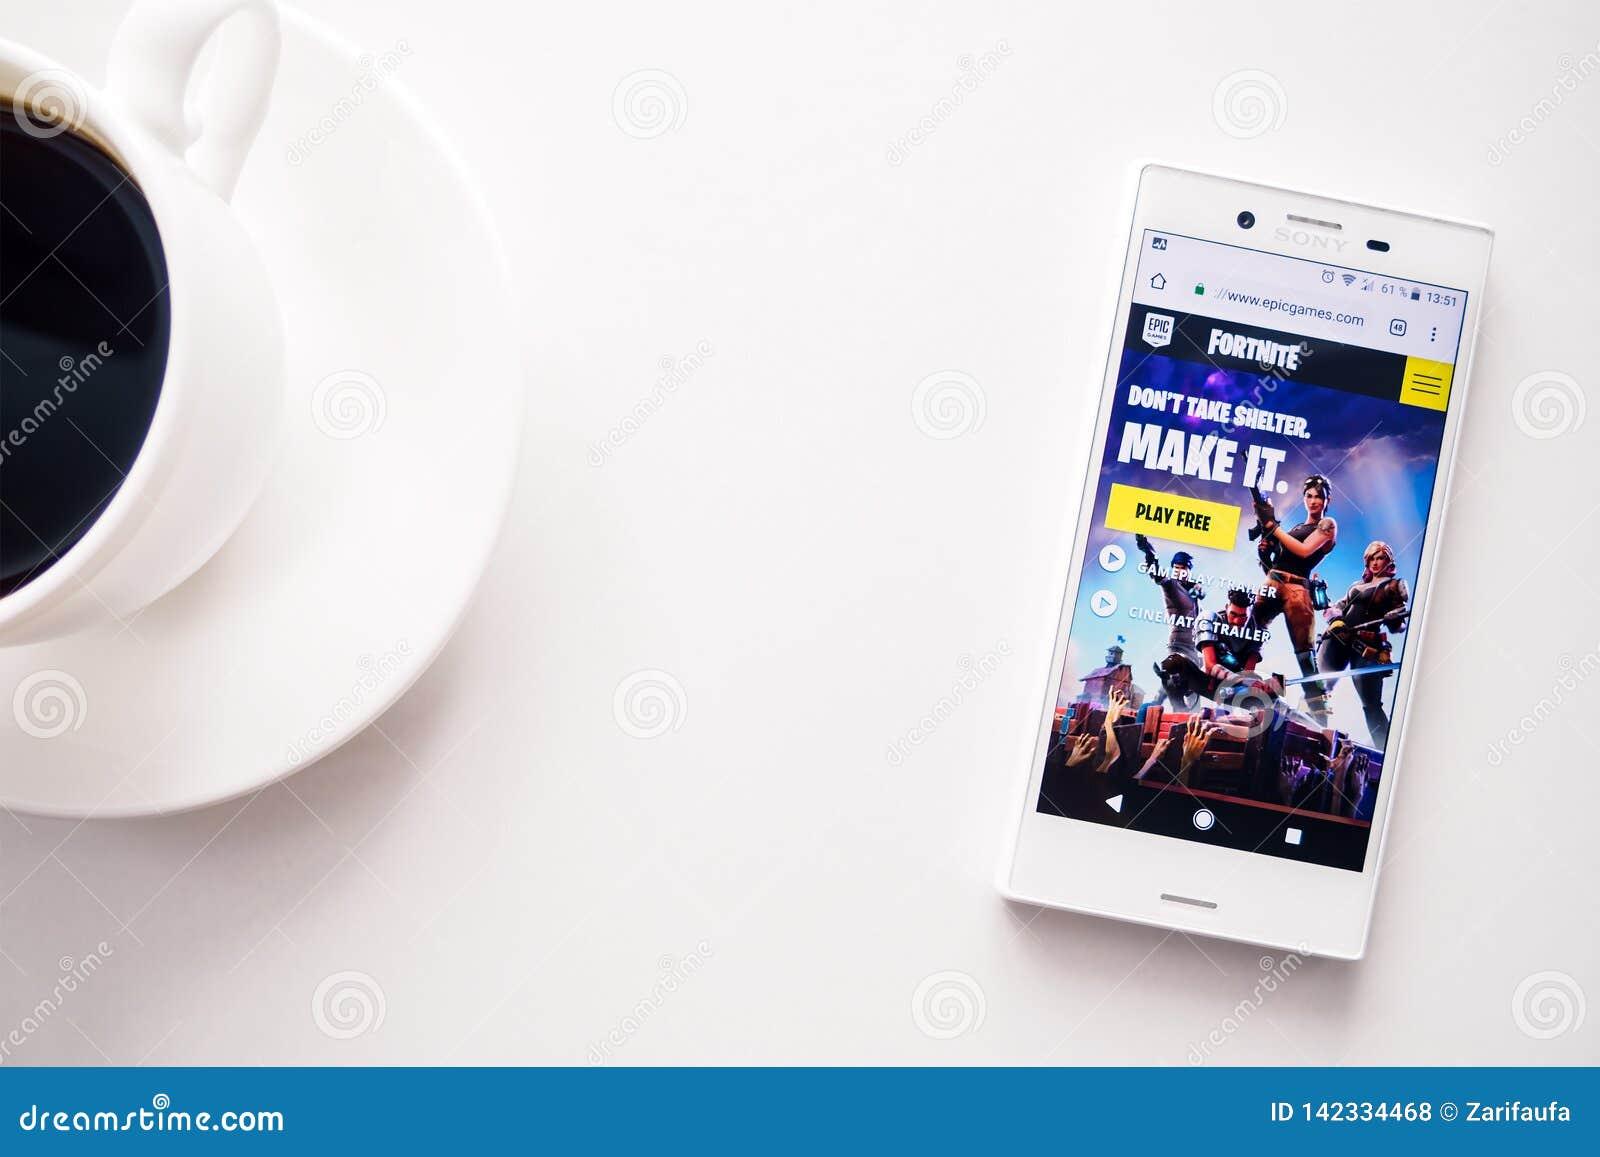 Ufa, Ρωσία - 15 Μαρτίου 2019: η σελίδα έναρξης της περιοχής παιχνιδιών Fortnite στην αρρενωπή οθόνη smartphone, το τηλέφωνο και ο